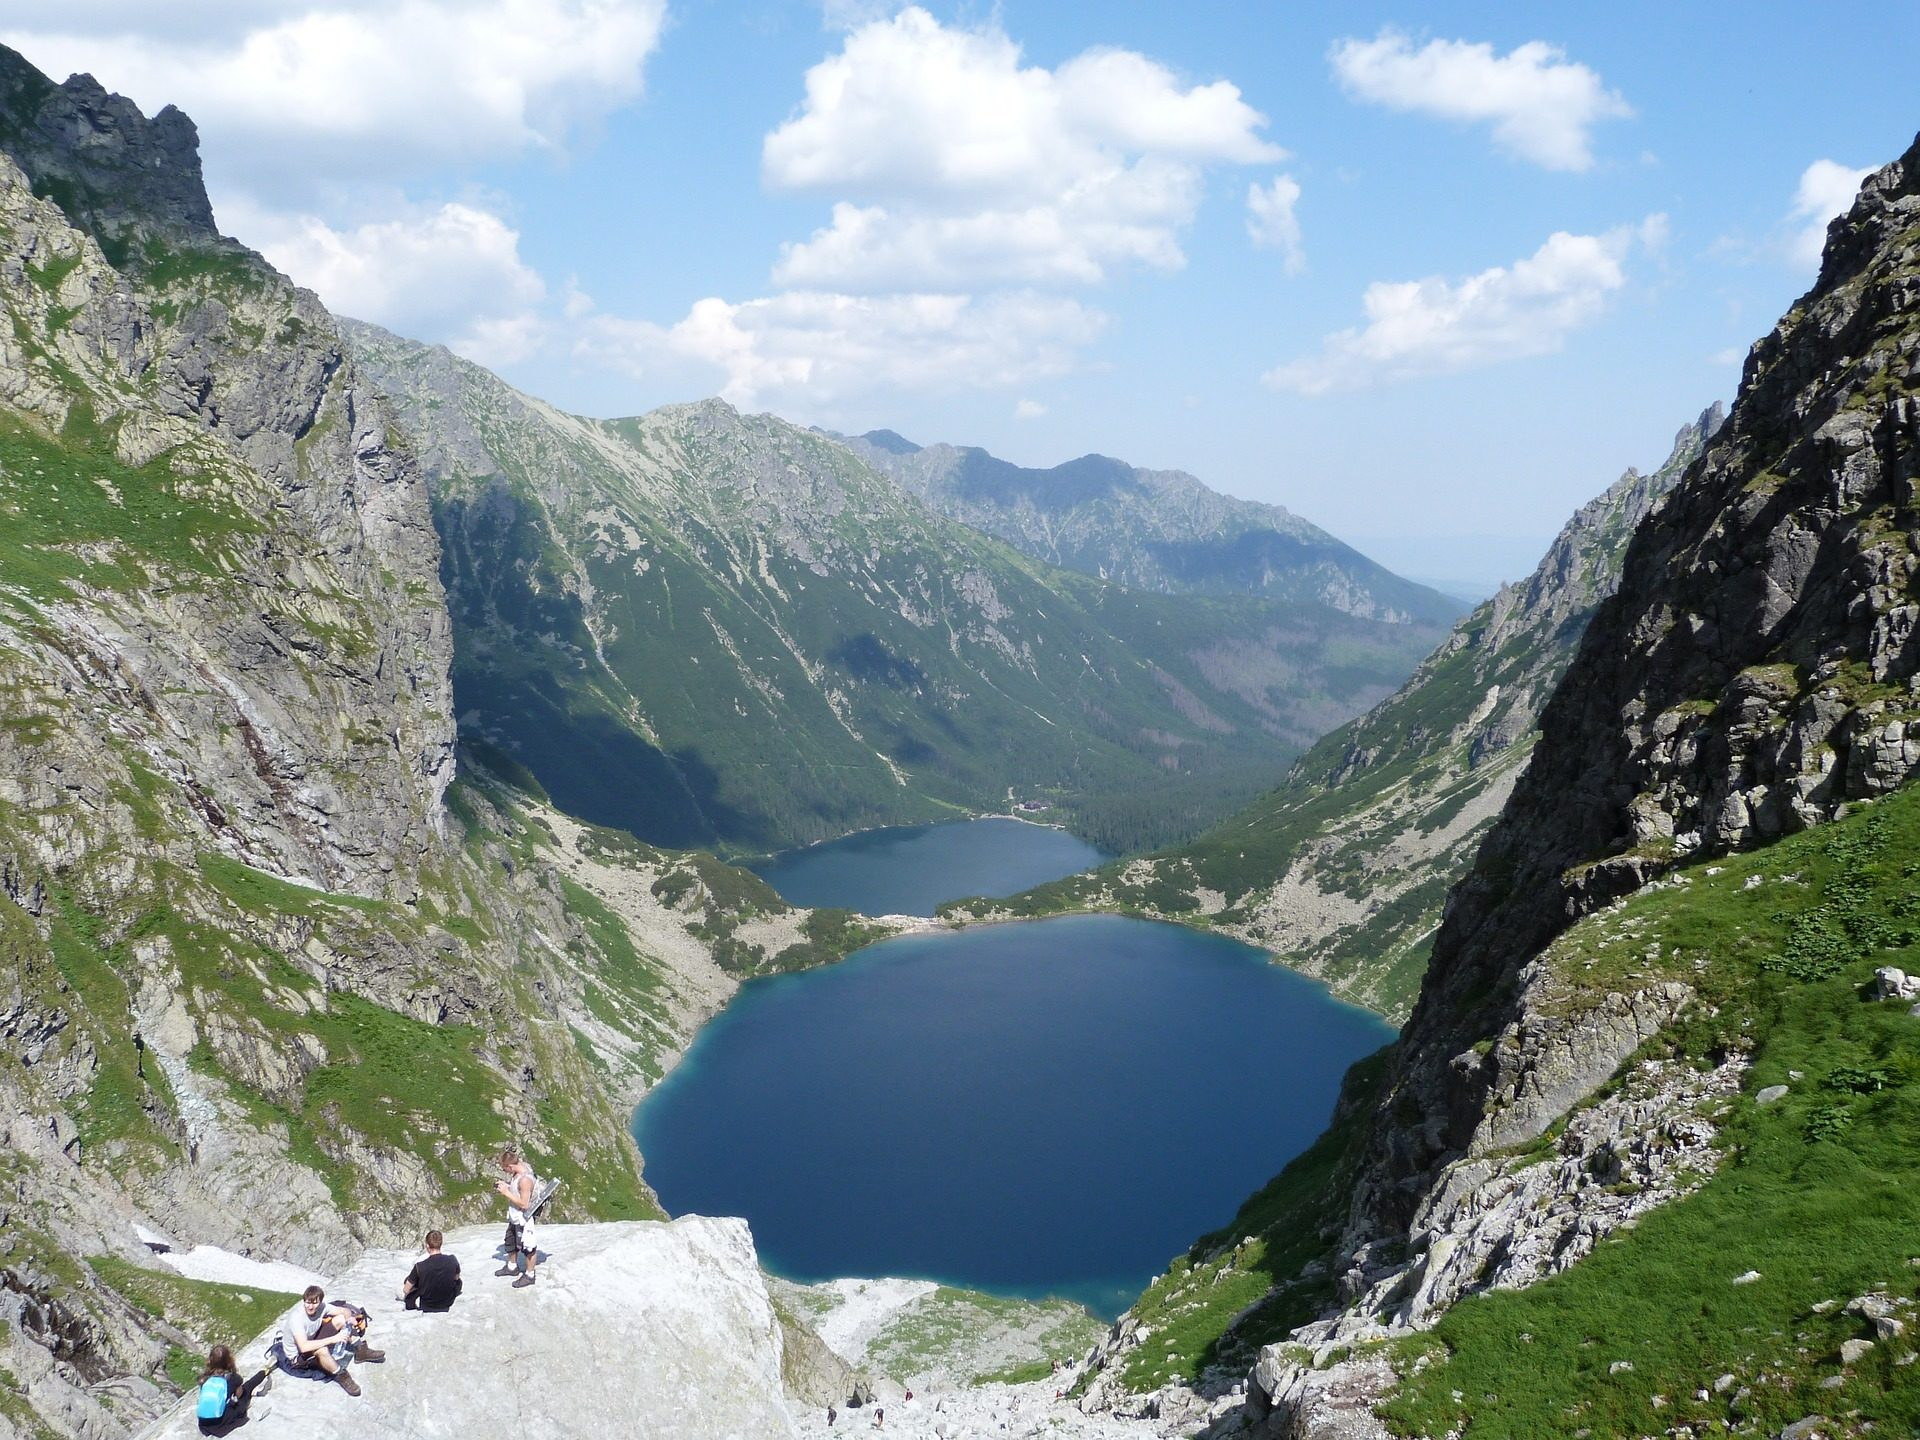 Vallée de, Montañas, Lake, Tourisme, eau, Pologne - Fonds d'écran HD - Professor-falken.com